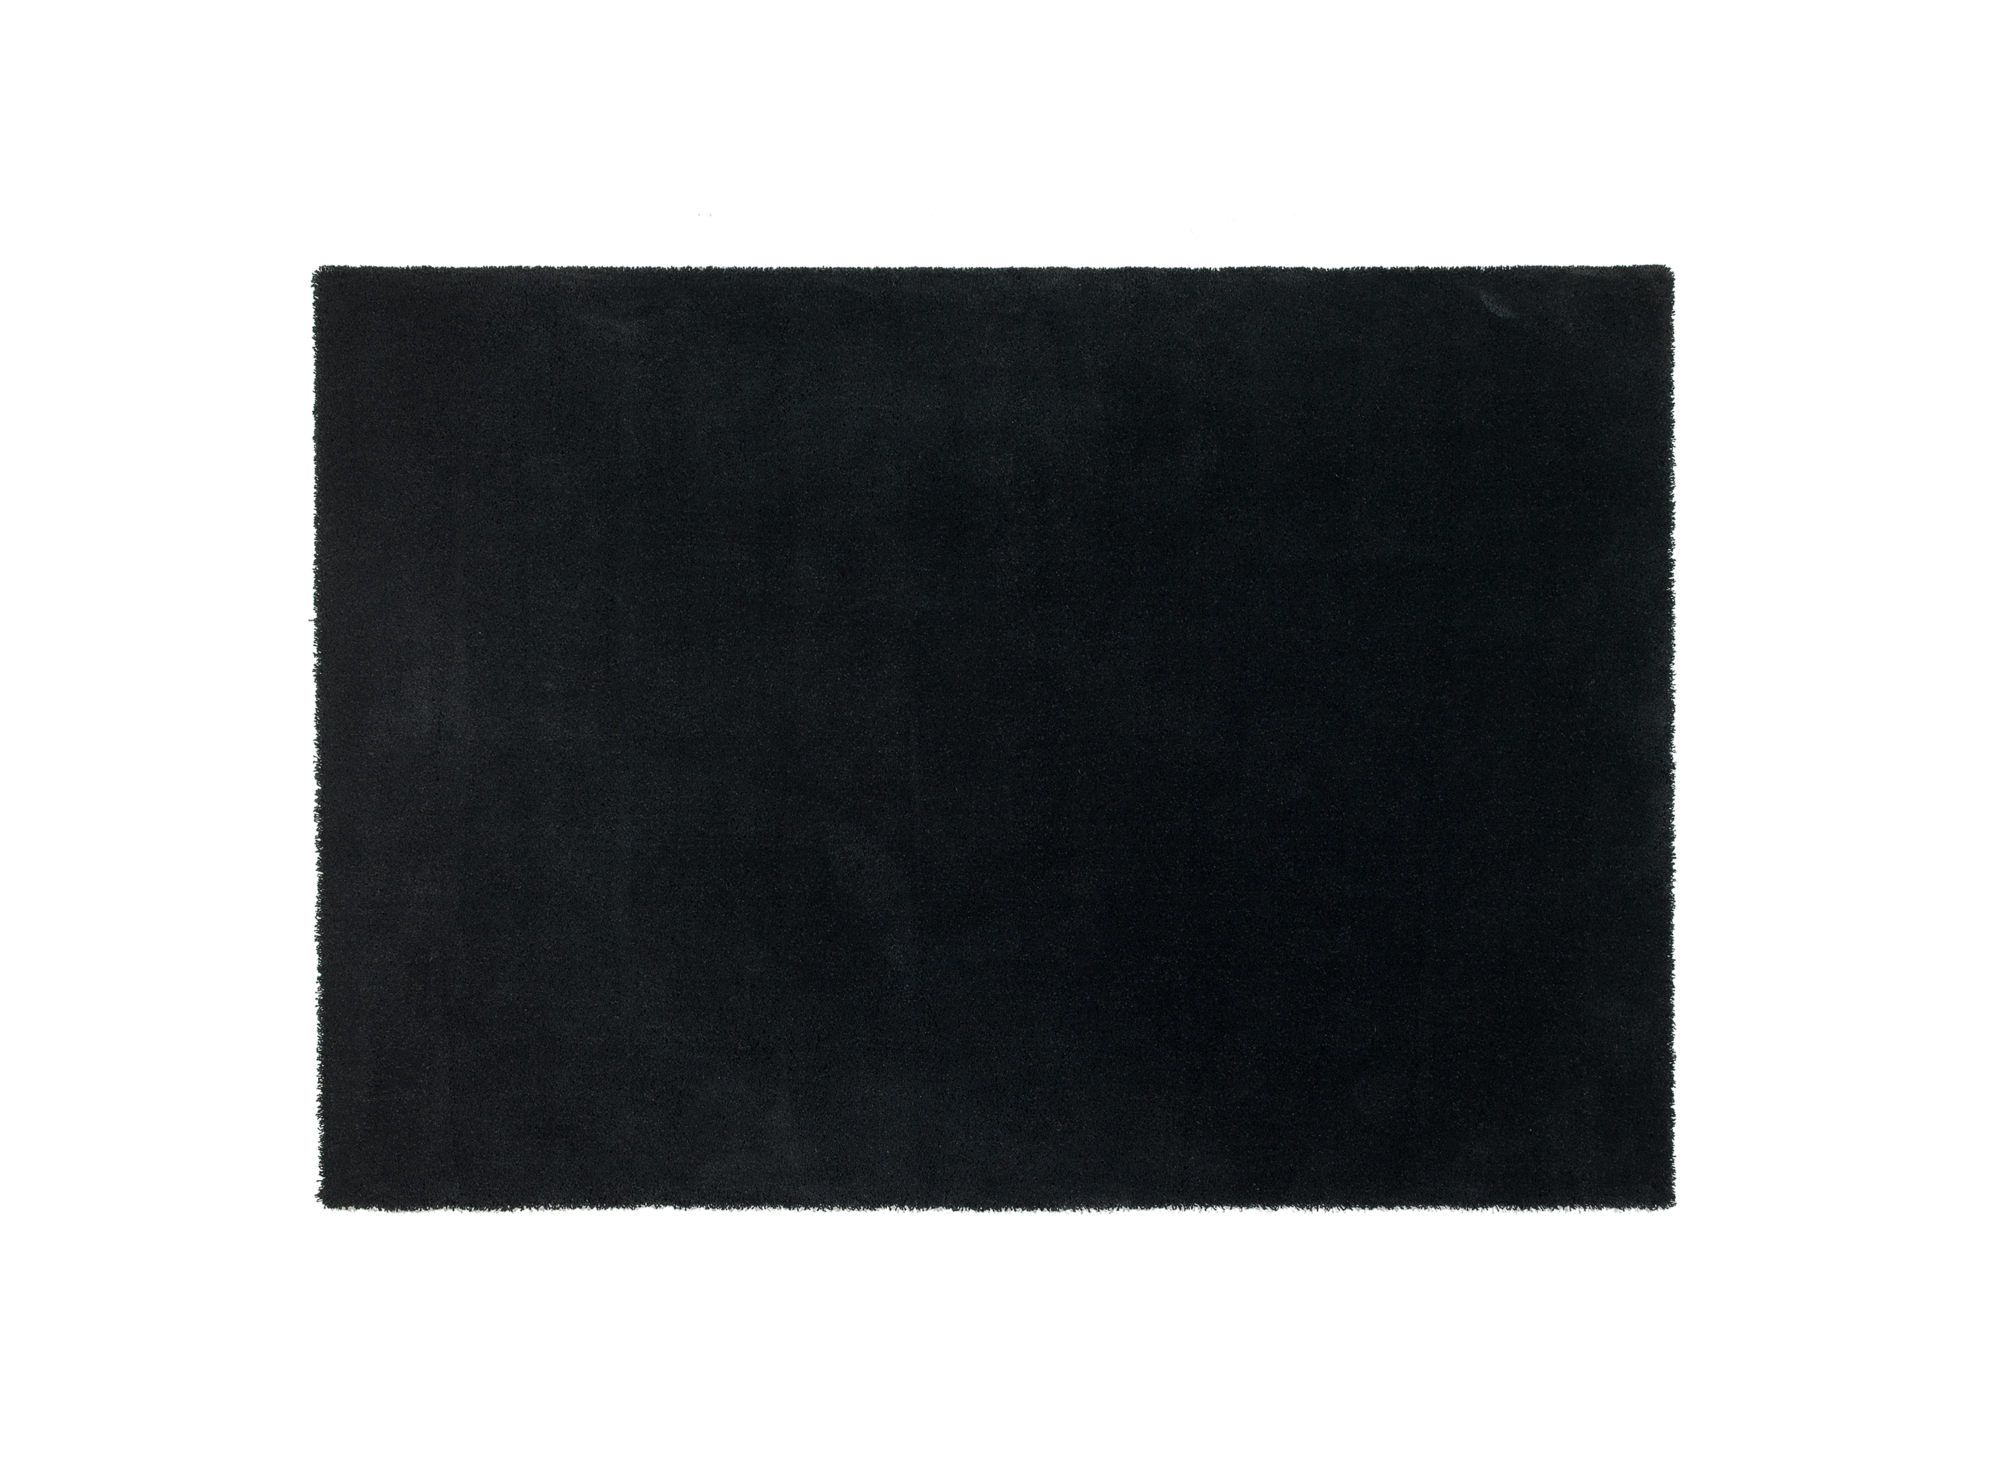 tapis 170x120 noir tapis chambre salon tapis textile fly. Black Bedroom Furniture Sets. Home Design Ideas